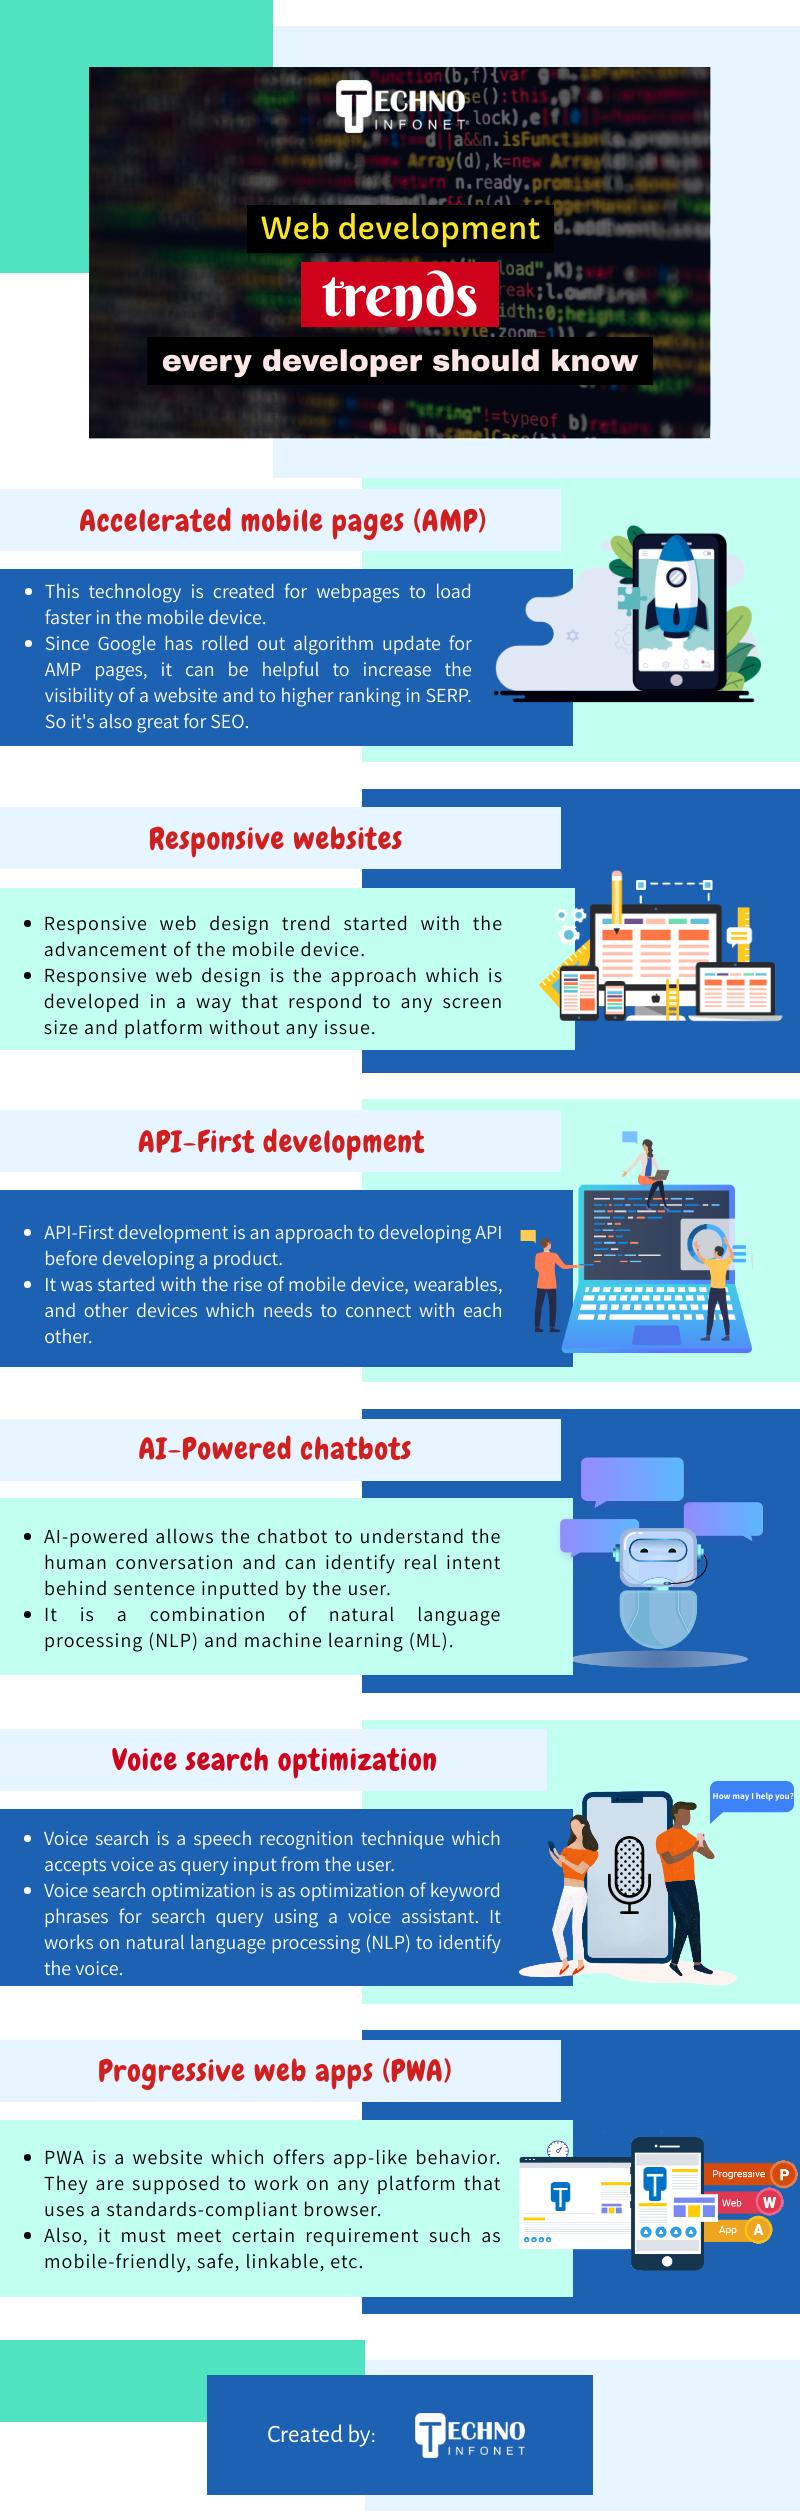 Web development trends every developer should know